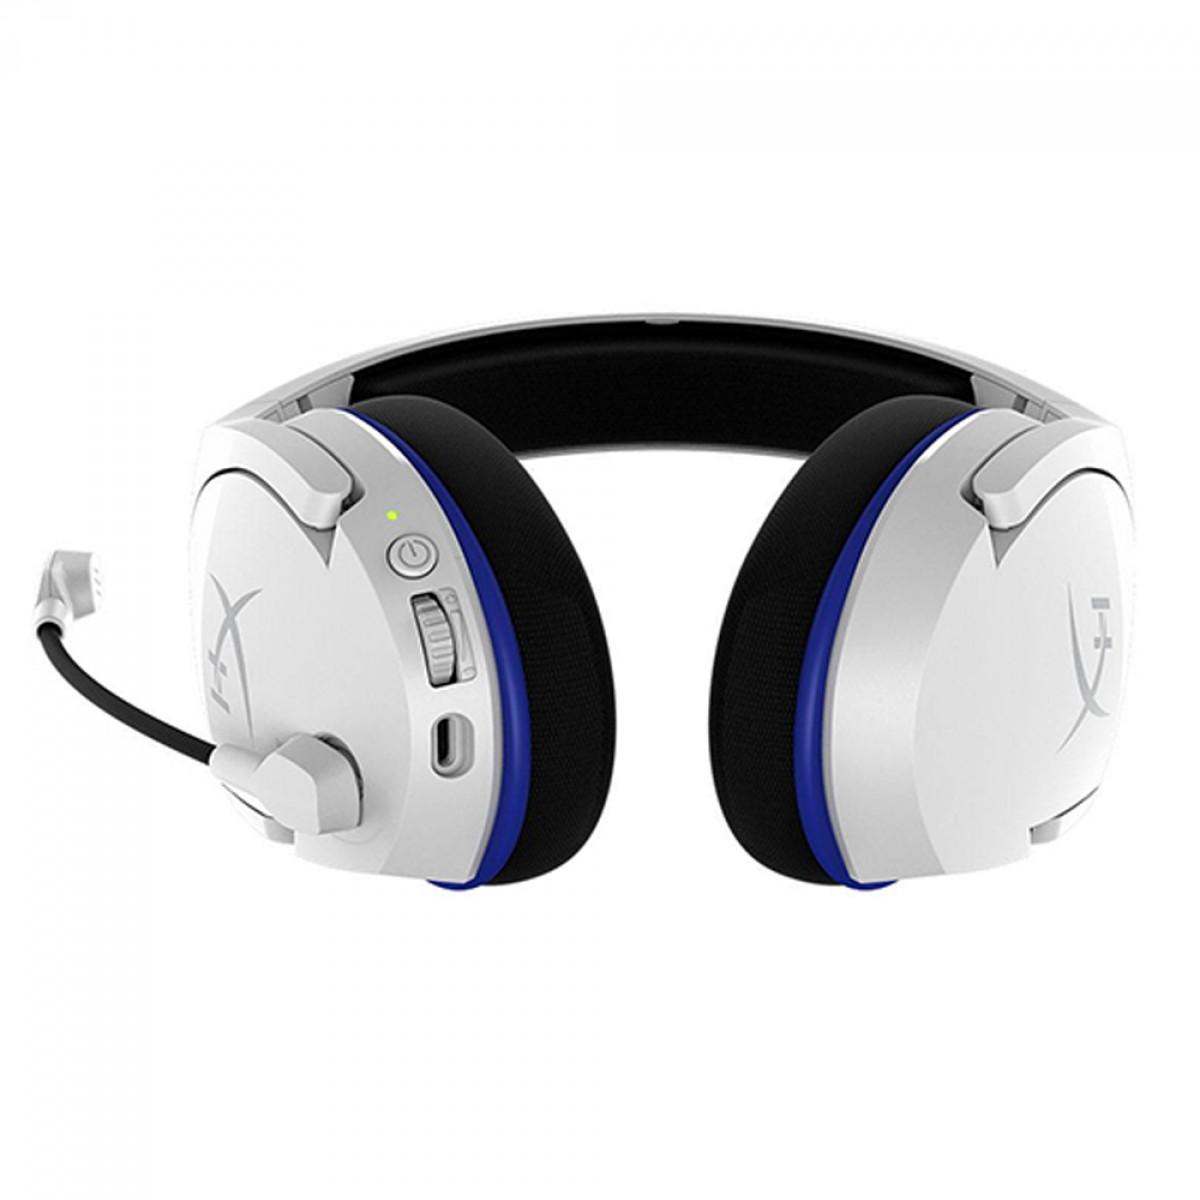 Headset Gamer Wireless HyperX Cloud Stinger Core, Driver 40mm, USB, White, HHSS1C-KB - WT/G